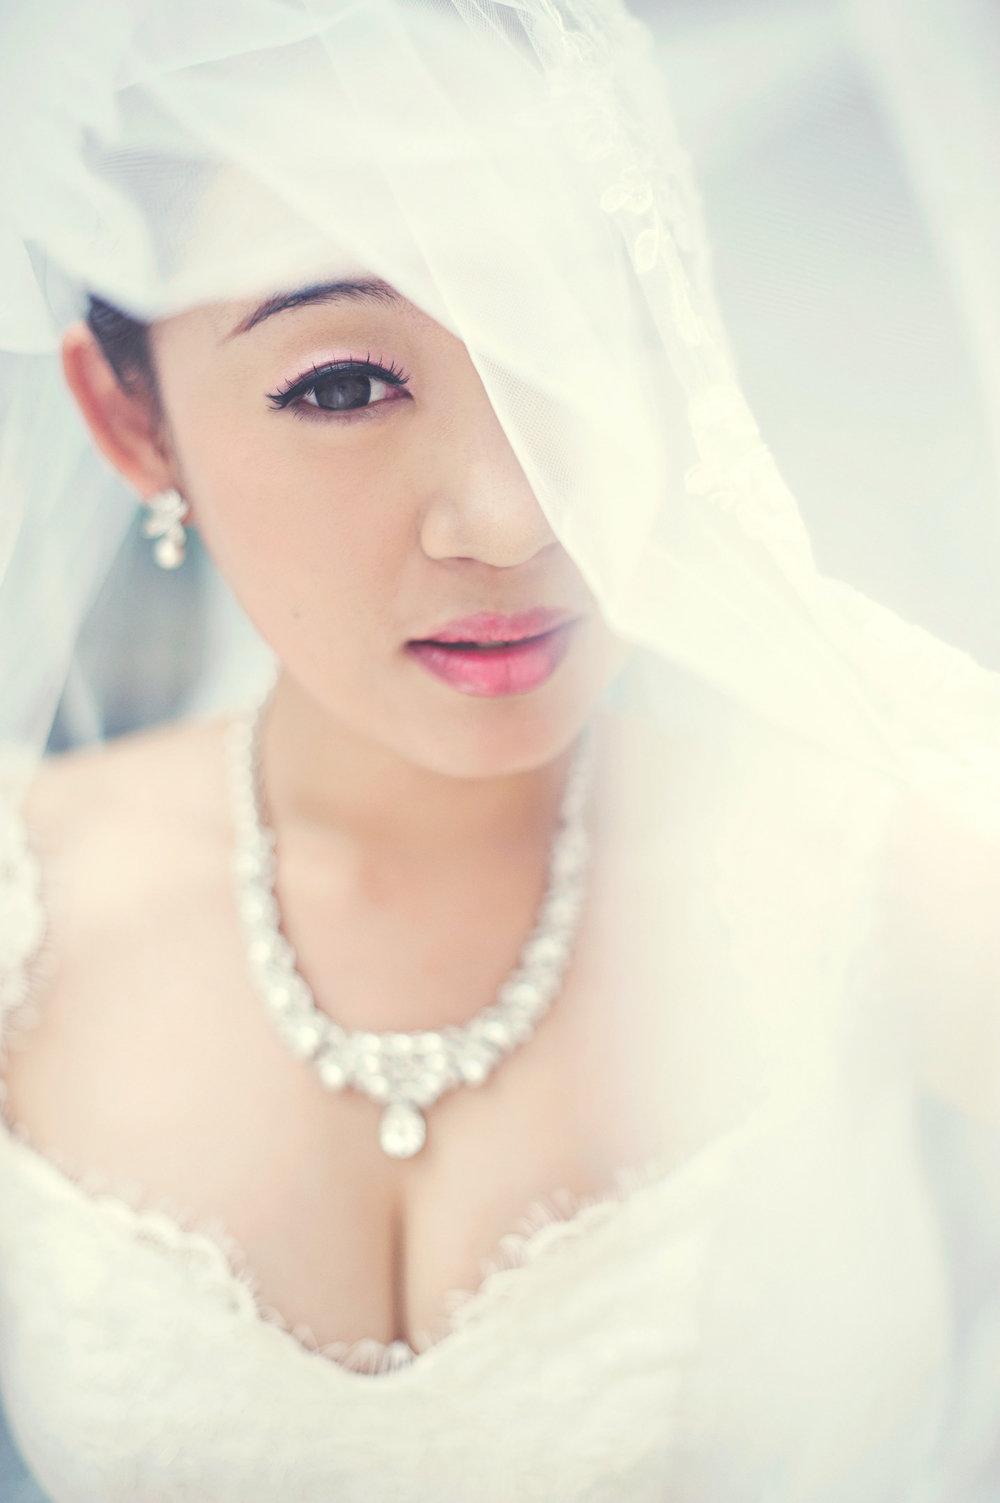 Chris_Hui_婚禮_婚紗照_pre_wedding_photography_best_056_.jpg